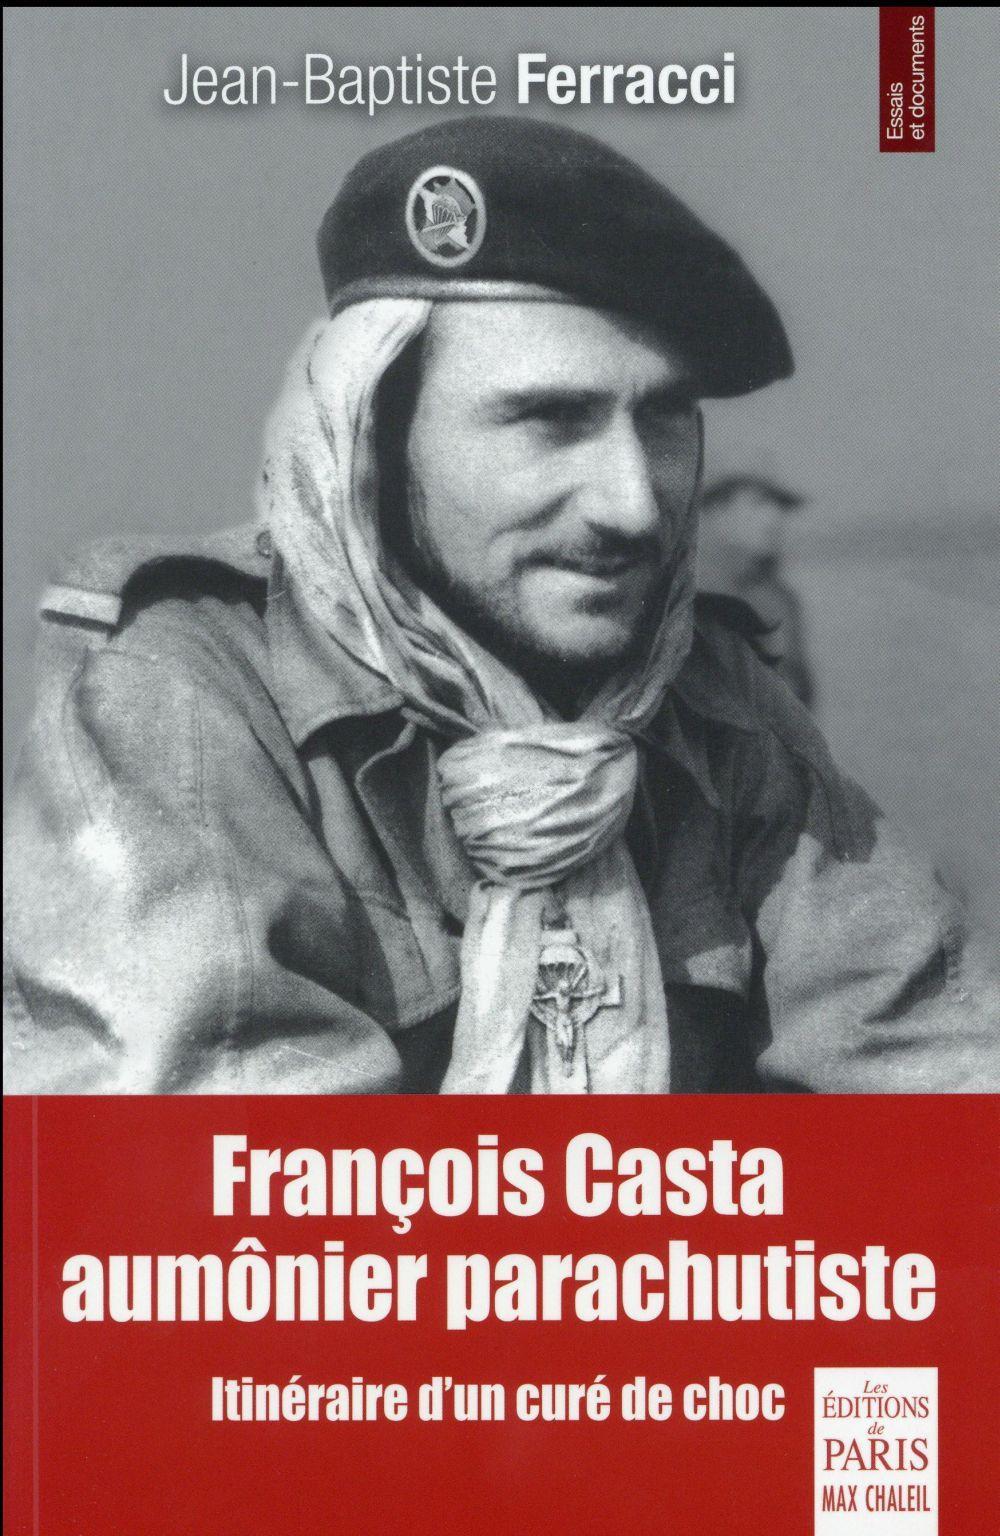 L'abbé François Casta, aumônier-parachutiste